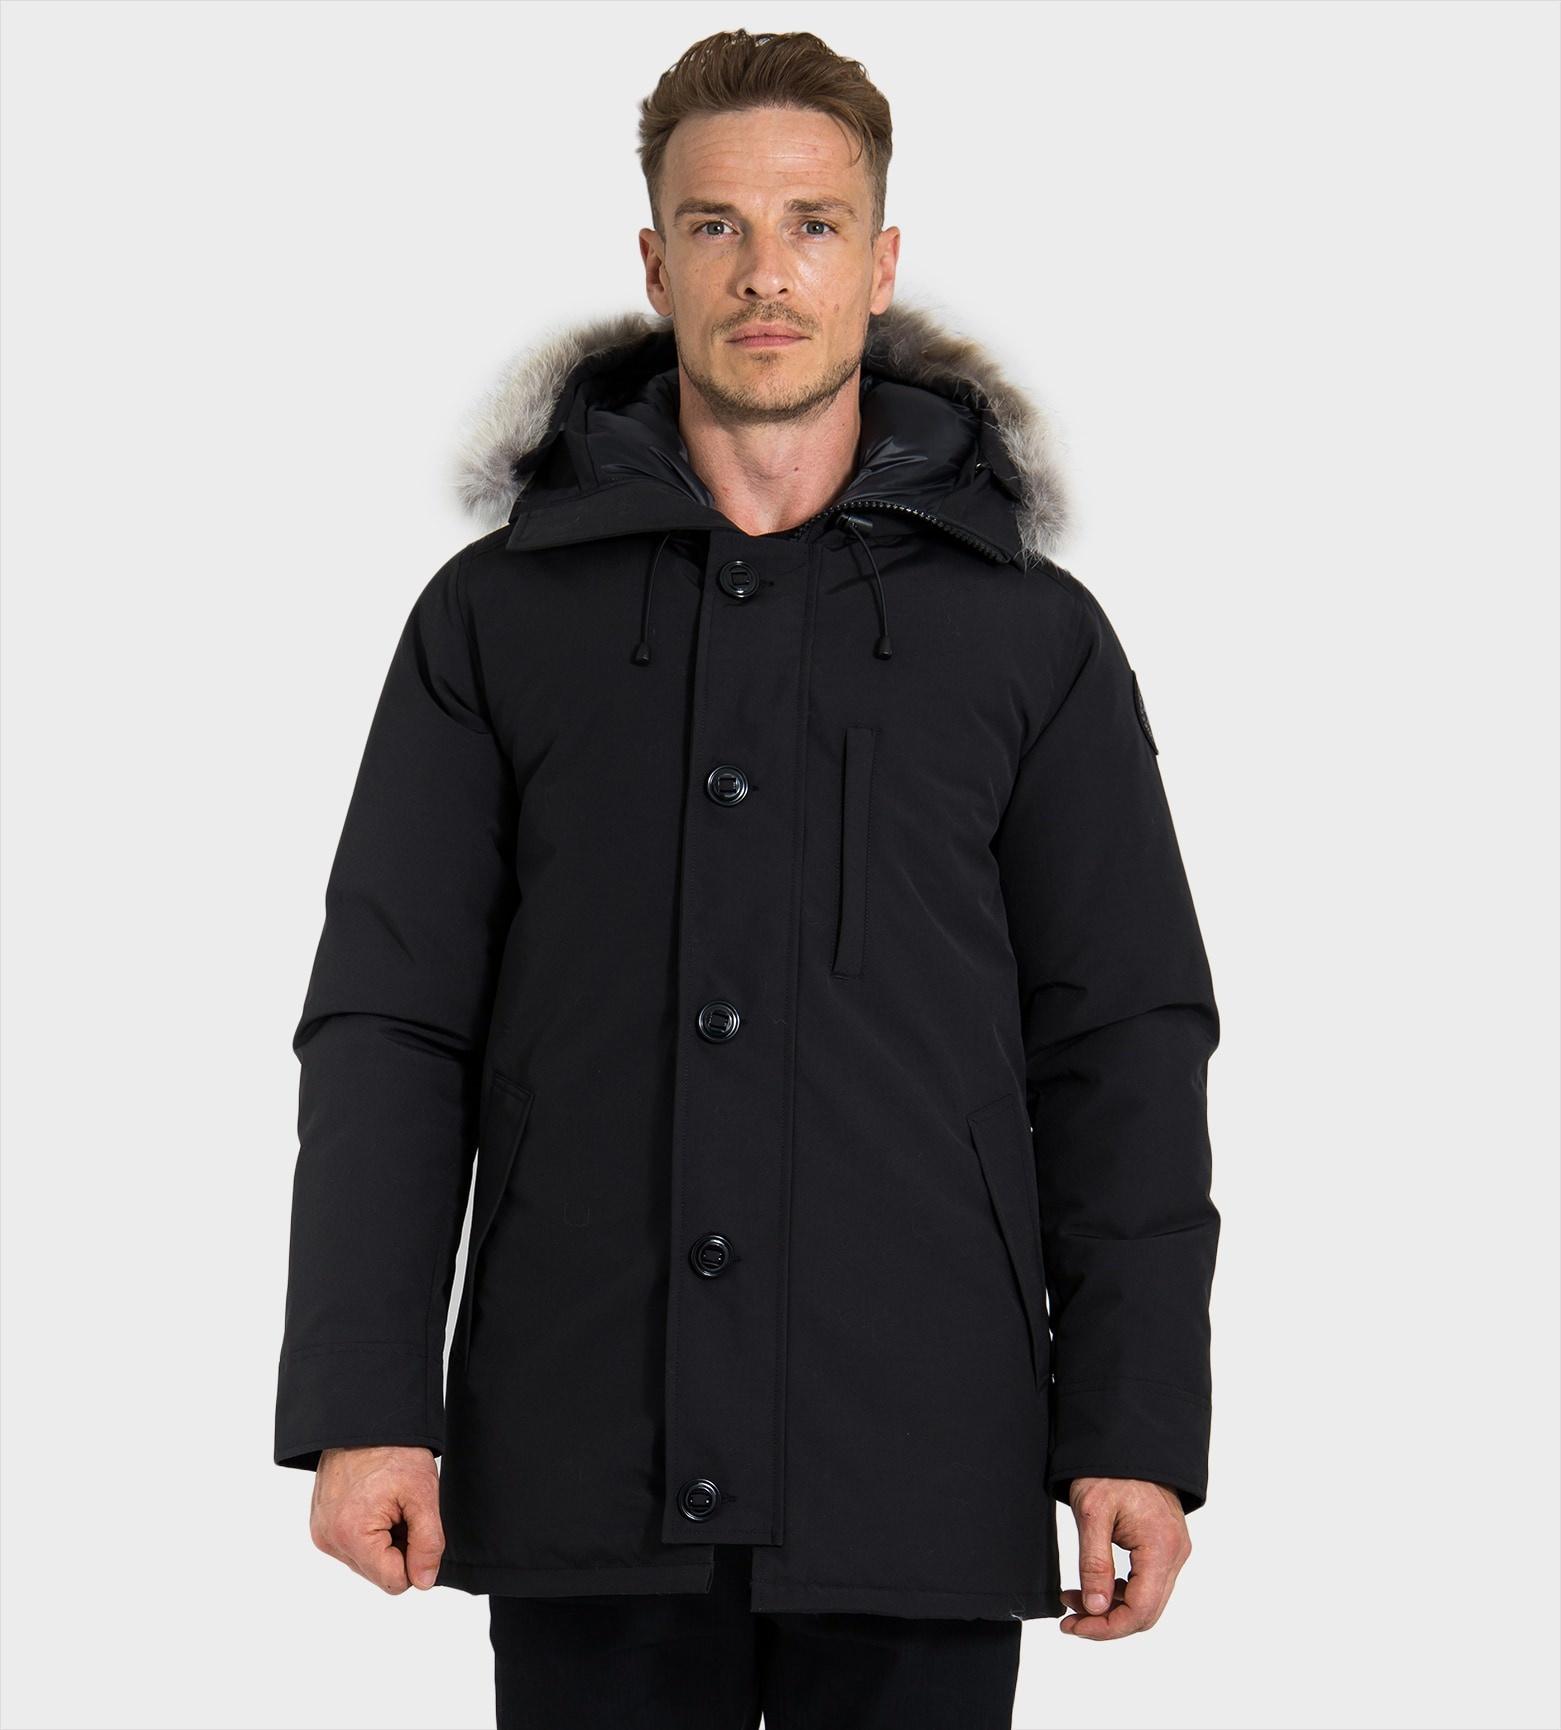 CANADA GOOSE Black Label Chateau Jacket